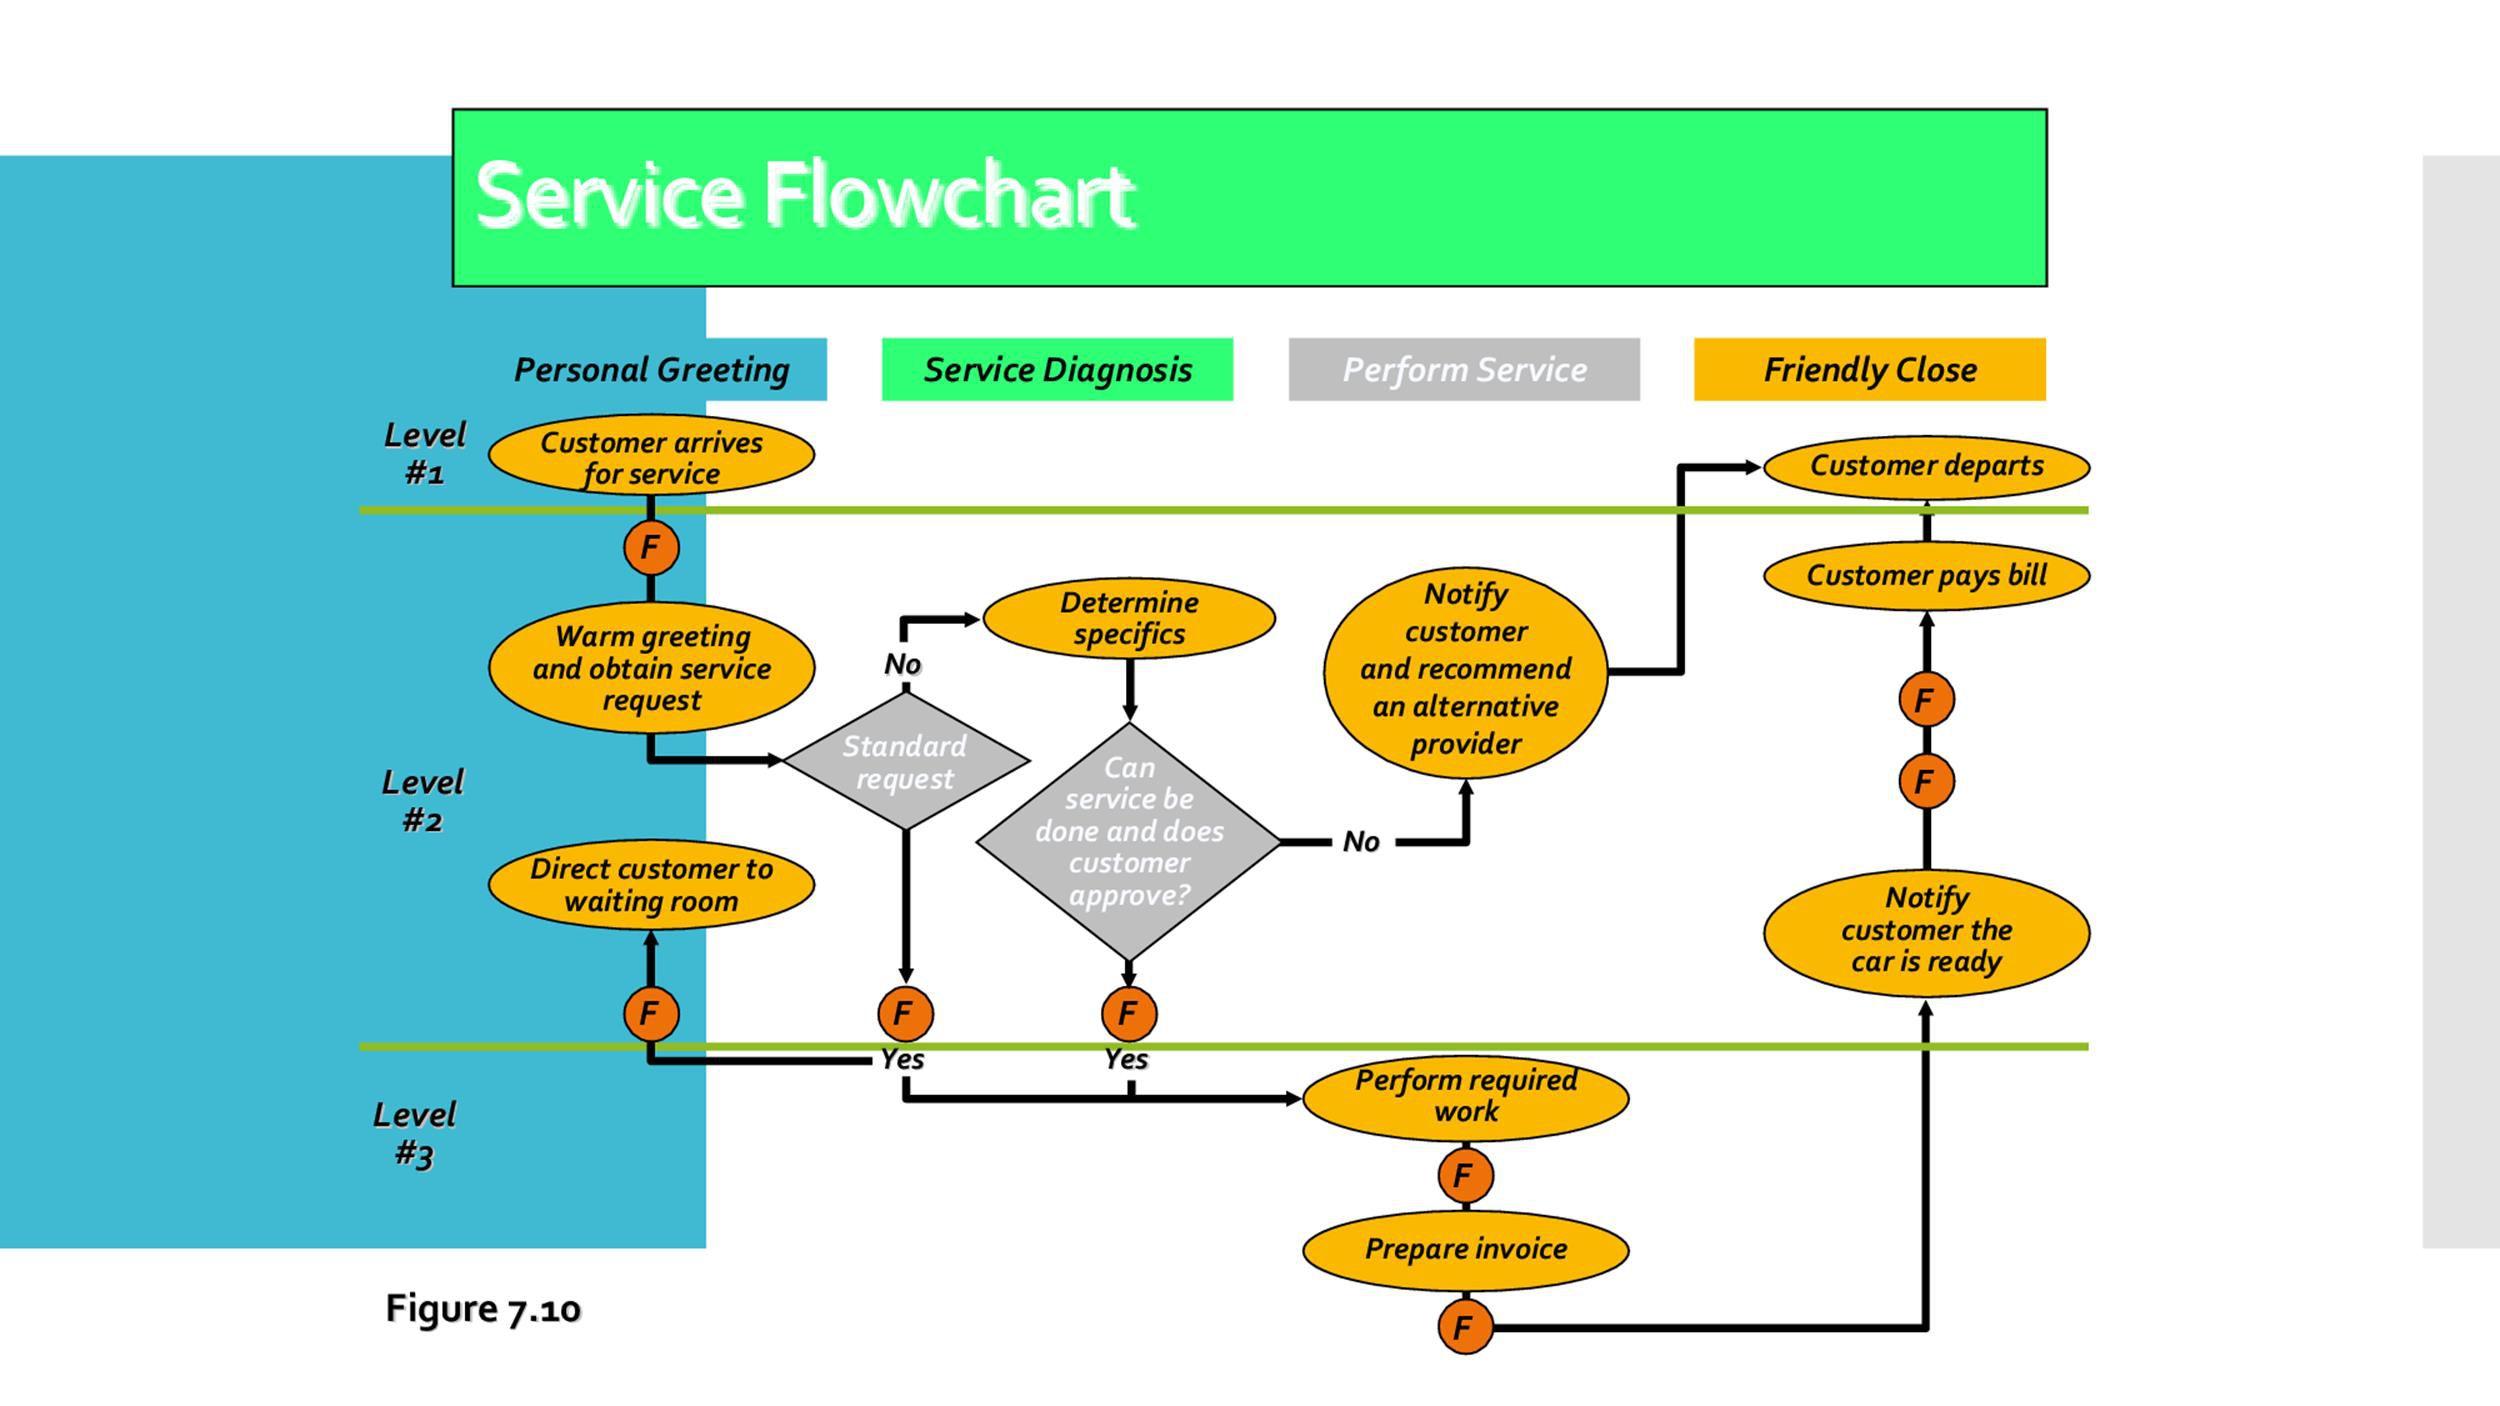 006 Fantastic Excel Flow Chart Template Inspiration  Templates Basic Flowchart Microsoft Free 2010Full